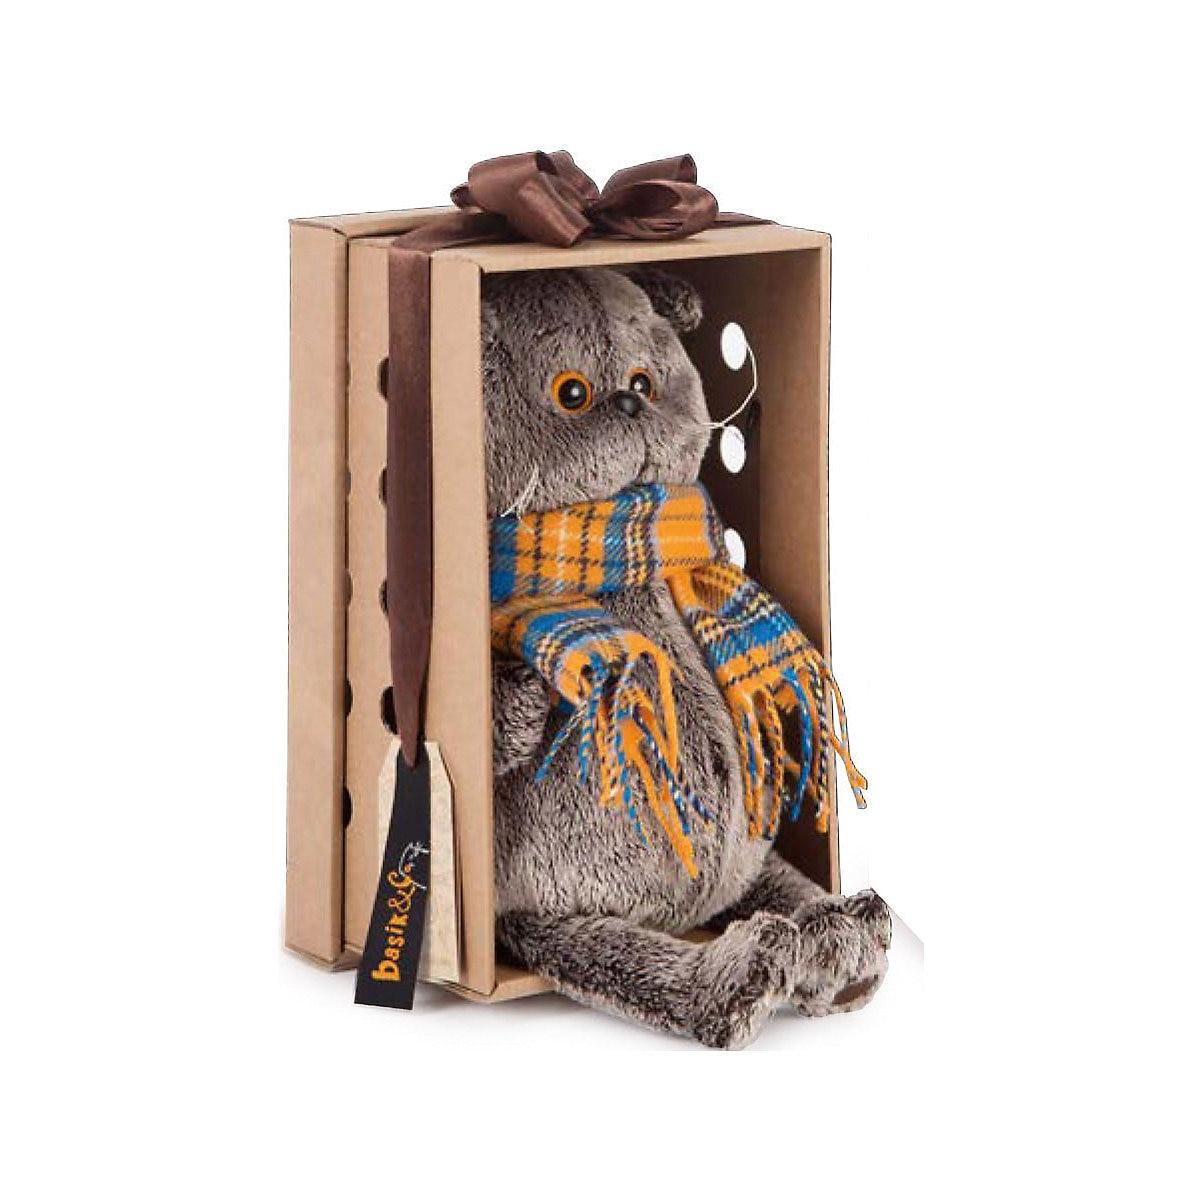 Gevulde & Pluche Dieren BUDI BASA 8999599 Stitch Beer Totoro Giraffe Fox Kat Hond Zachte kinderspeelgoed - 4